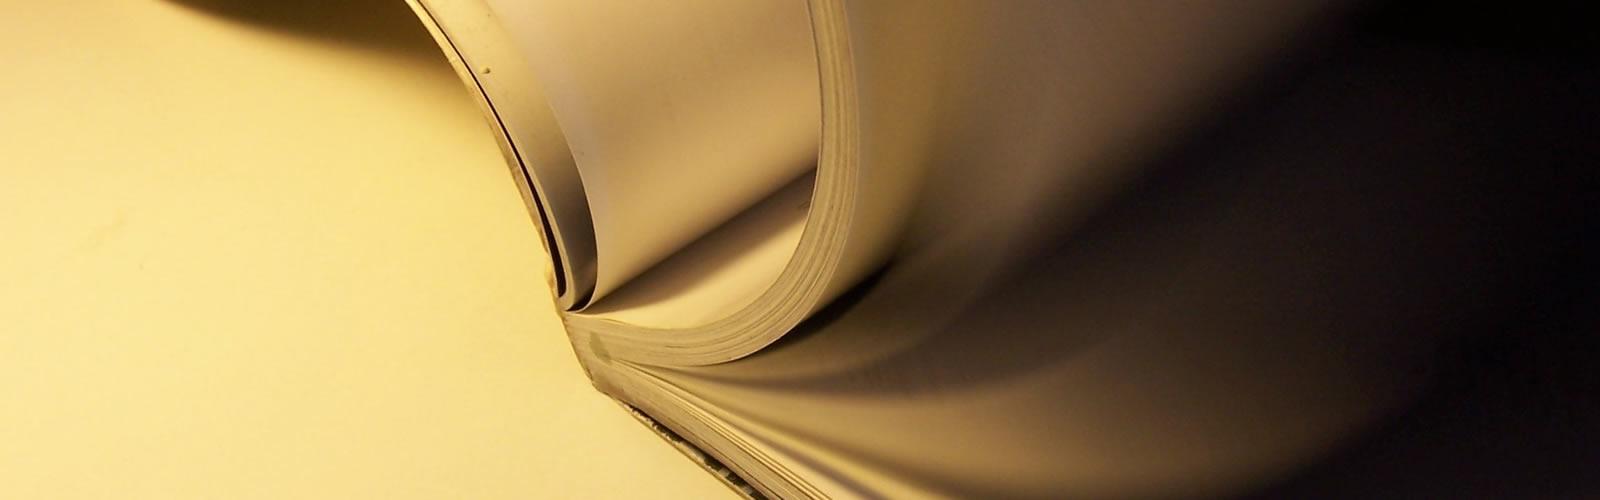 Bookbinding Insurance